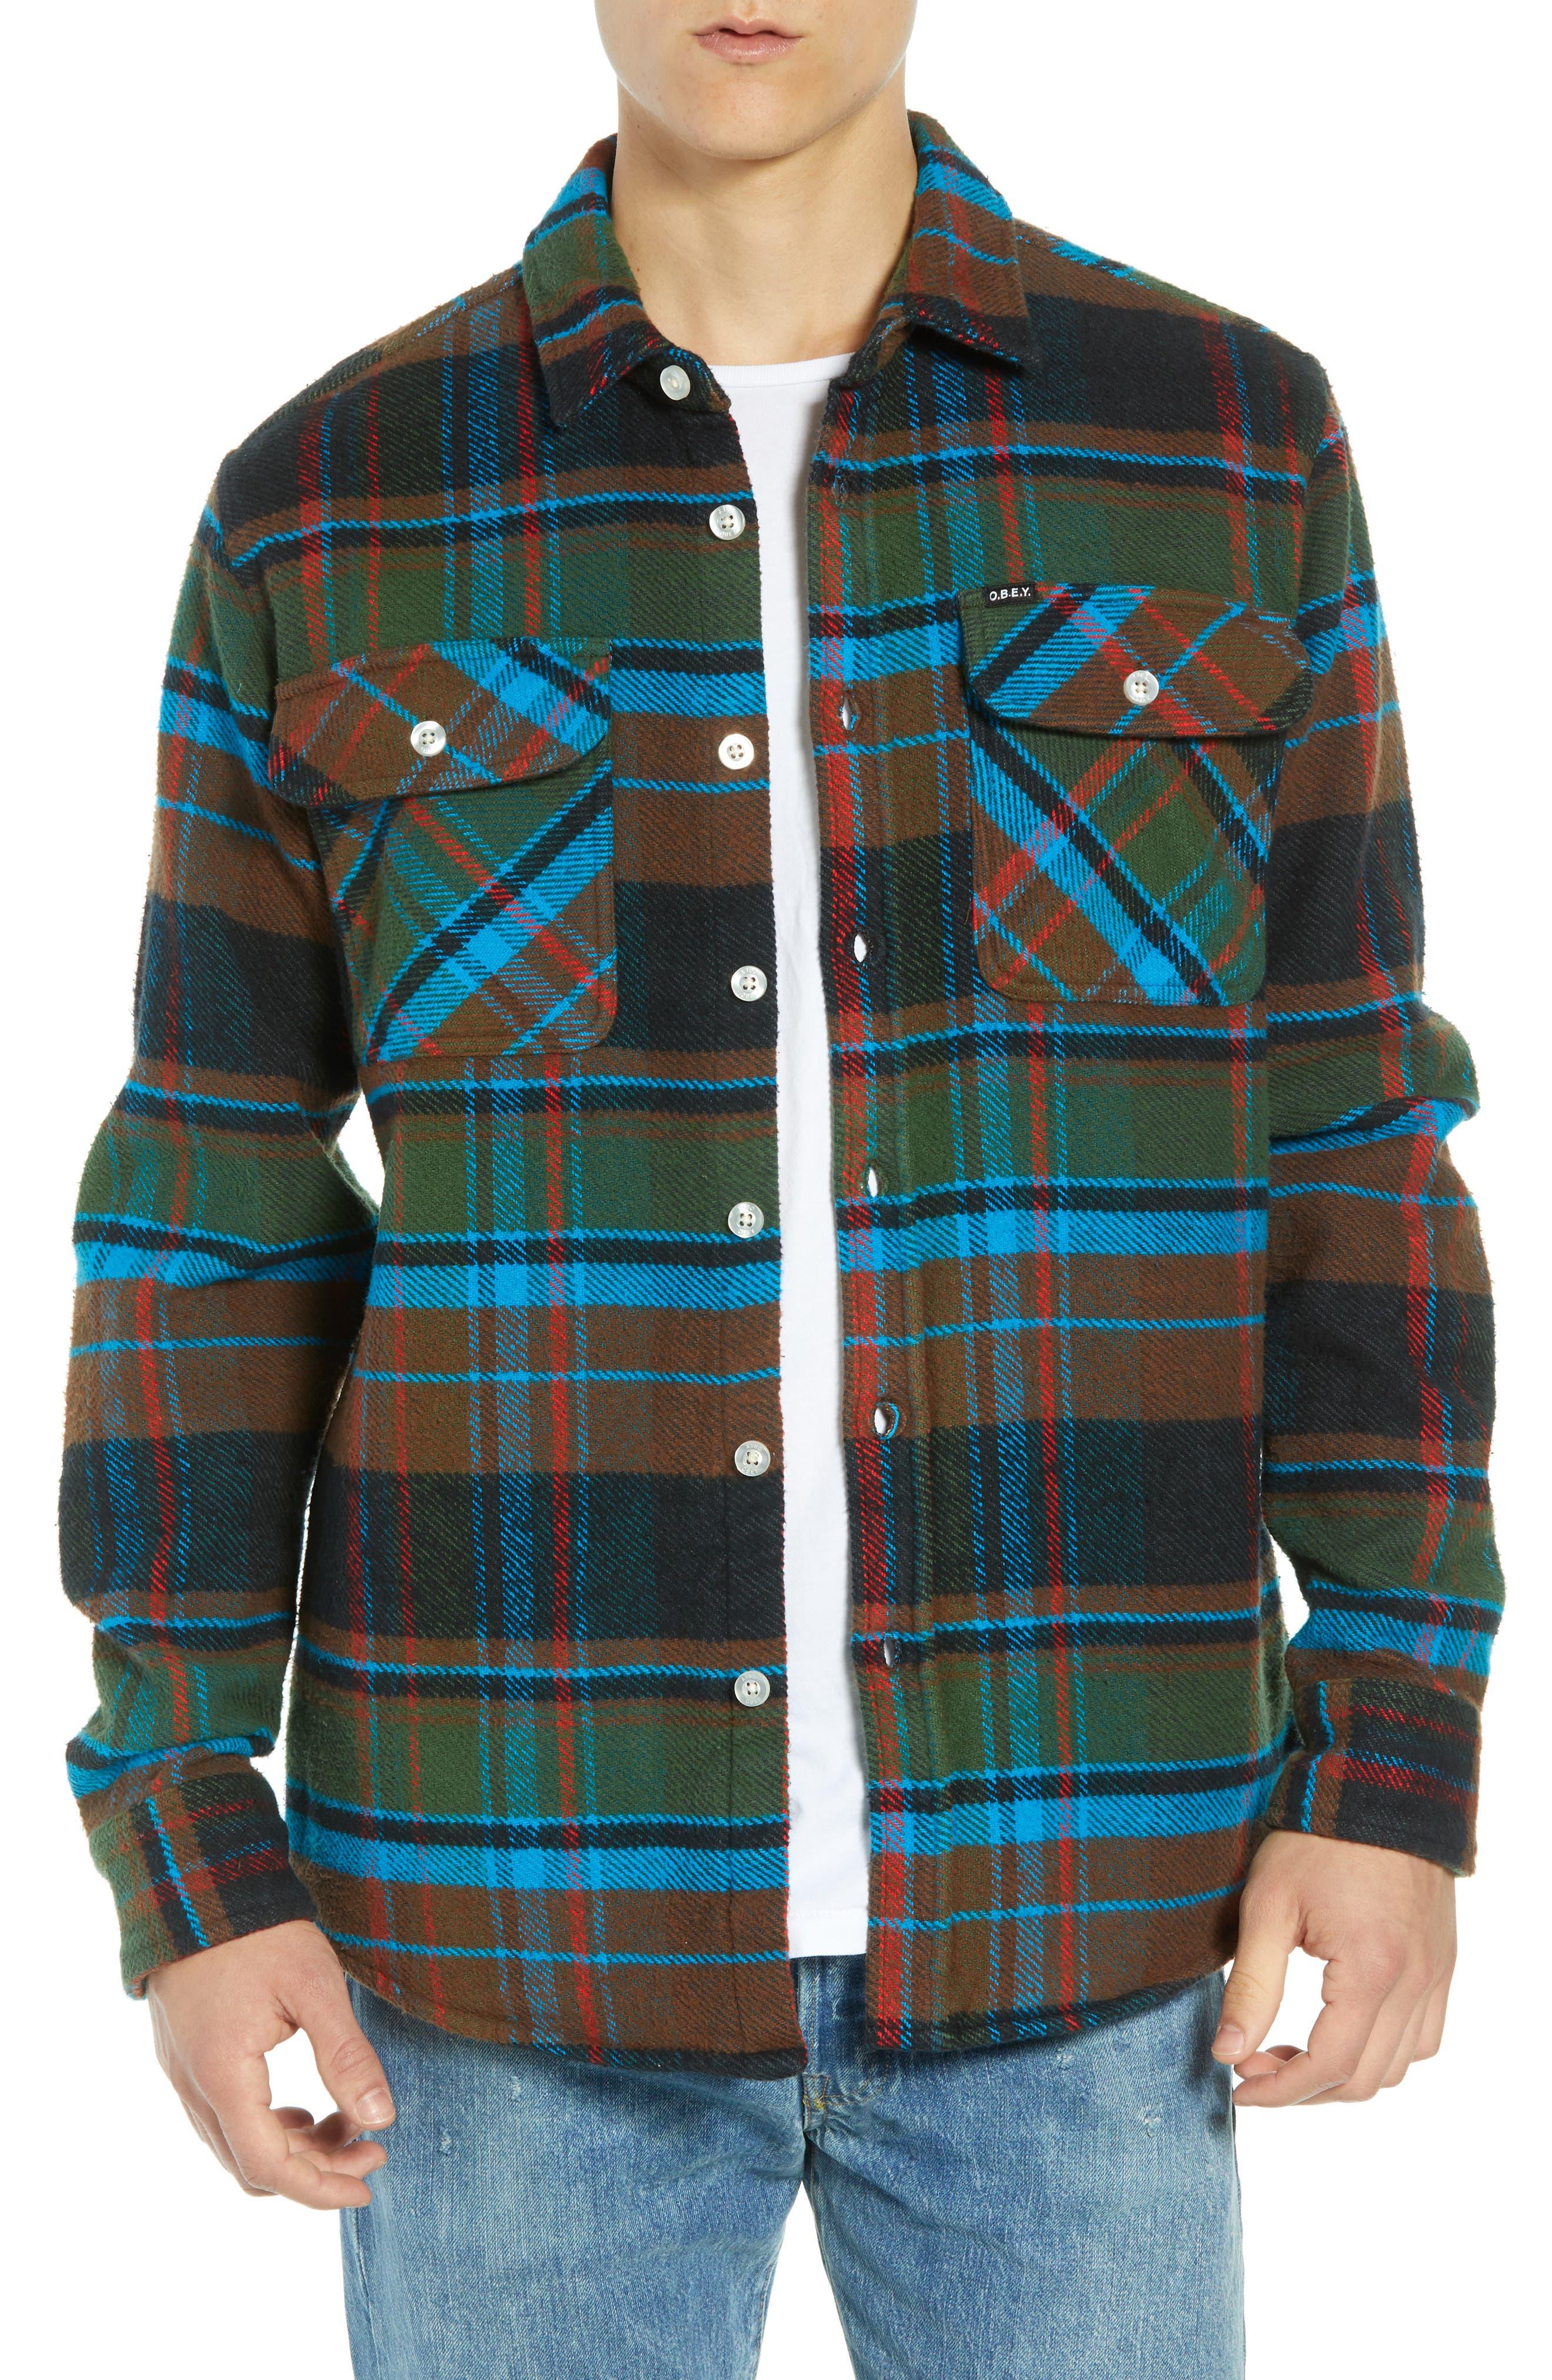 Obey Homebound Heavy Plaid Flannel Shirt Jacket, Green